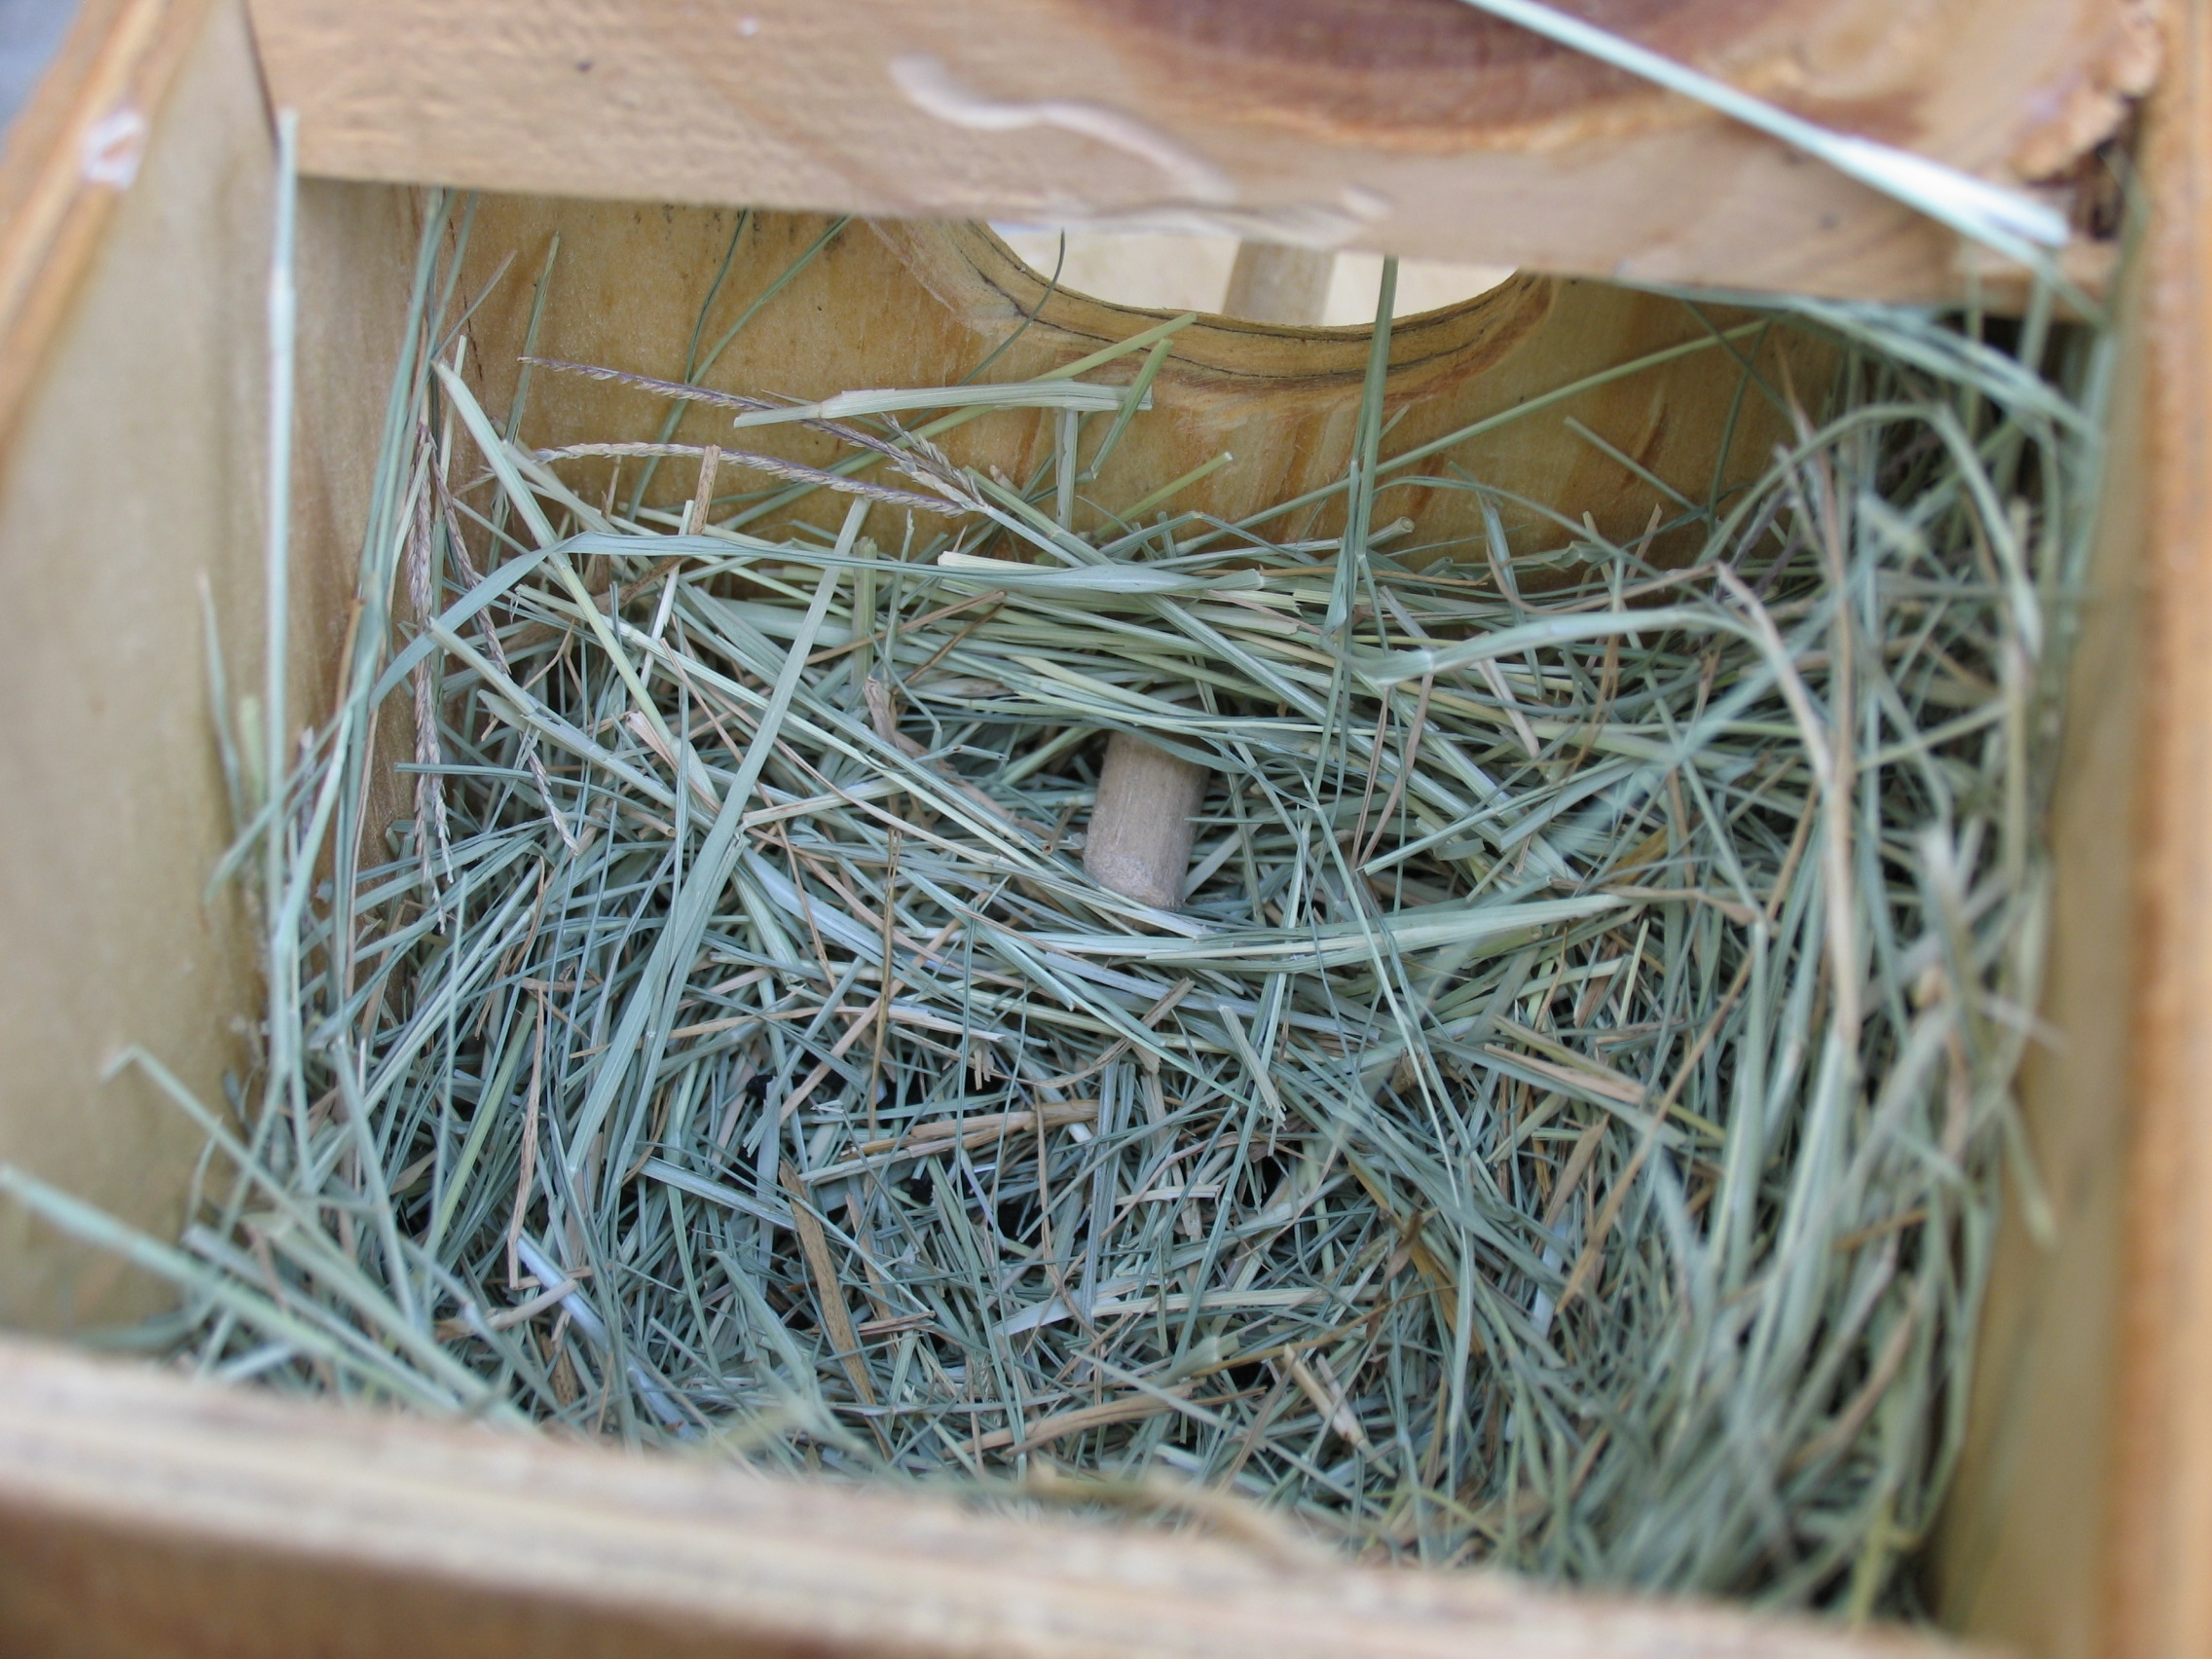 gouldian finch breeding season